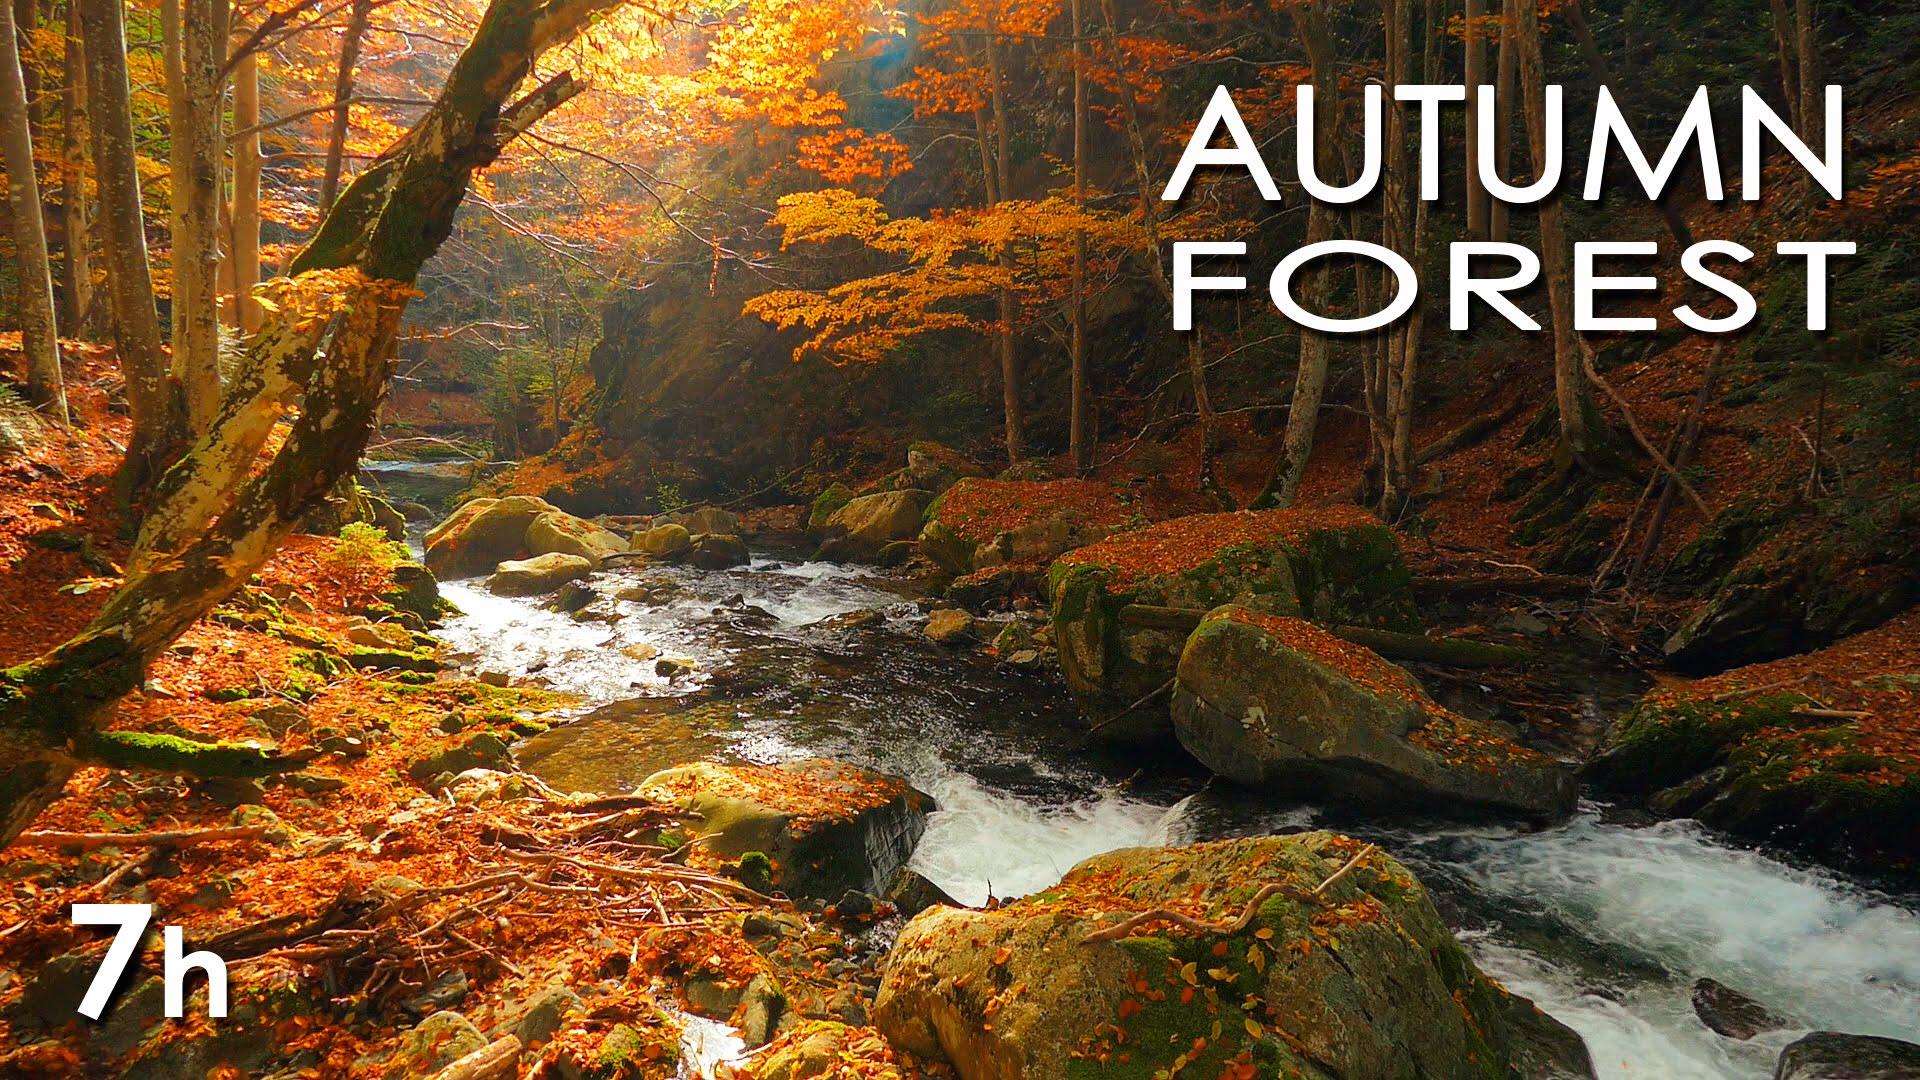 Leaf Wallpaper Wet Fall Free Photo Autumn River Season Scenic Serene Free